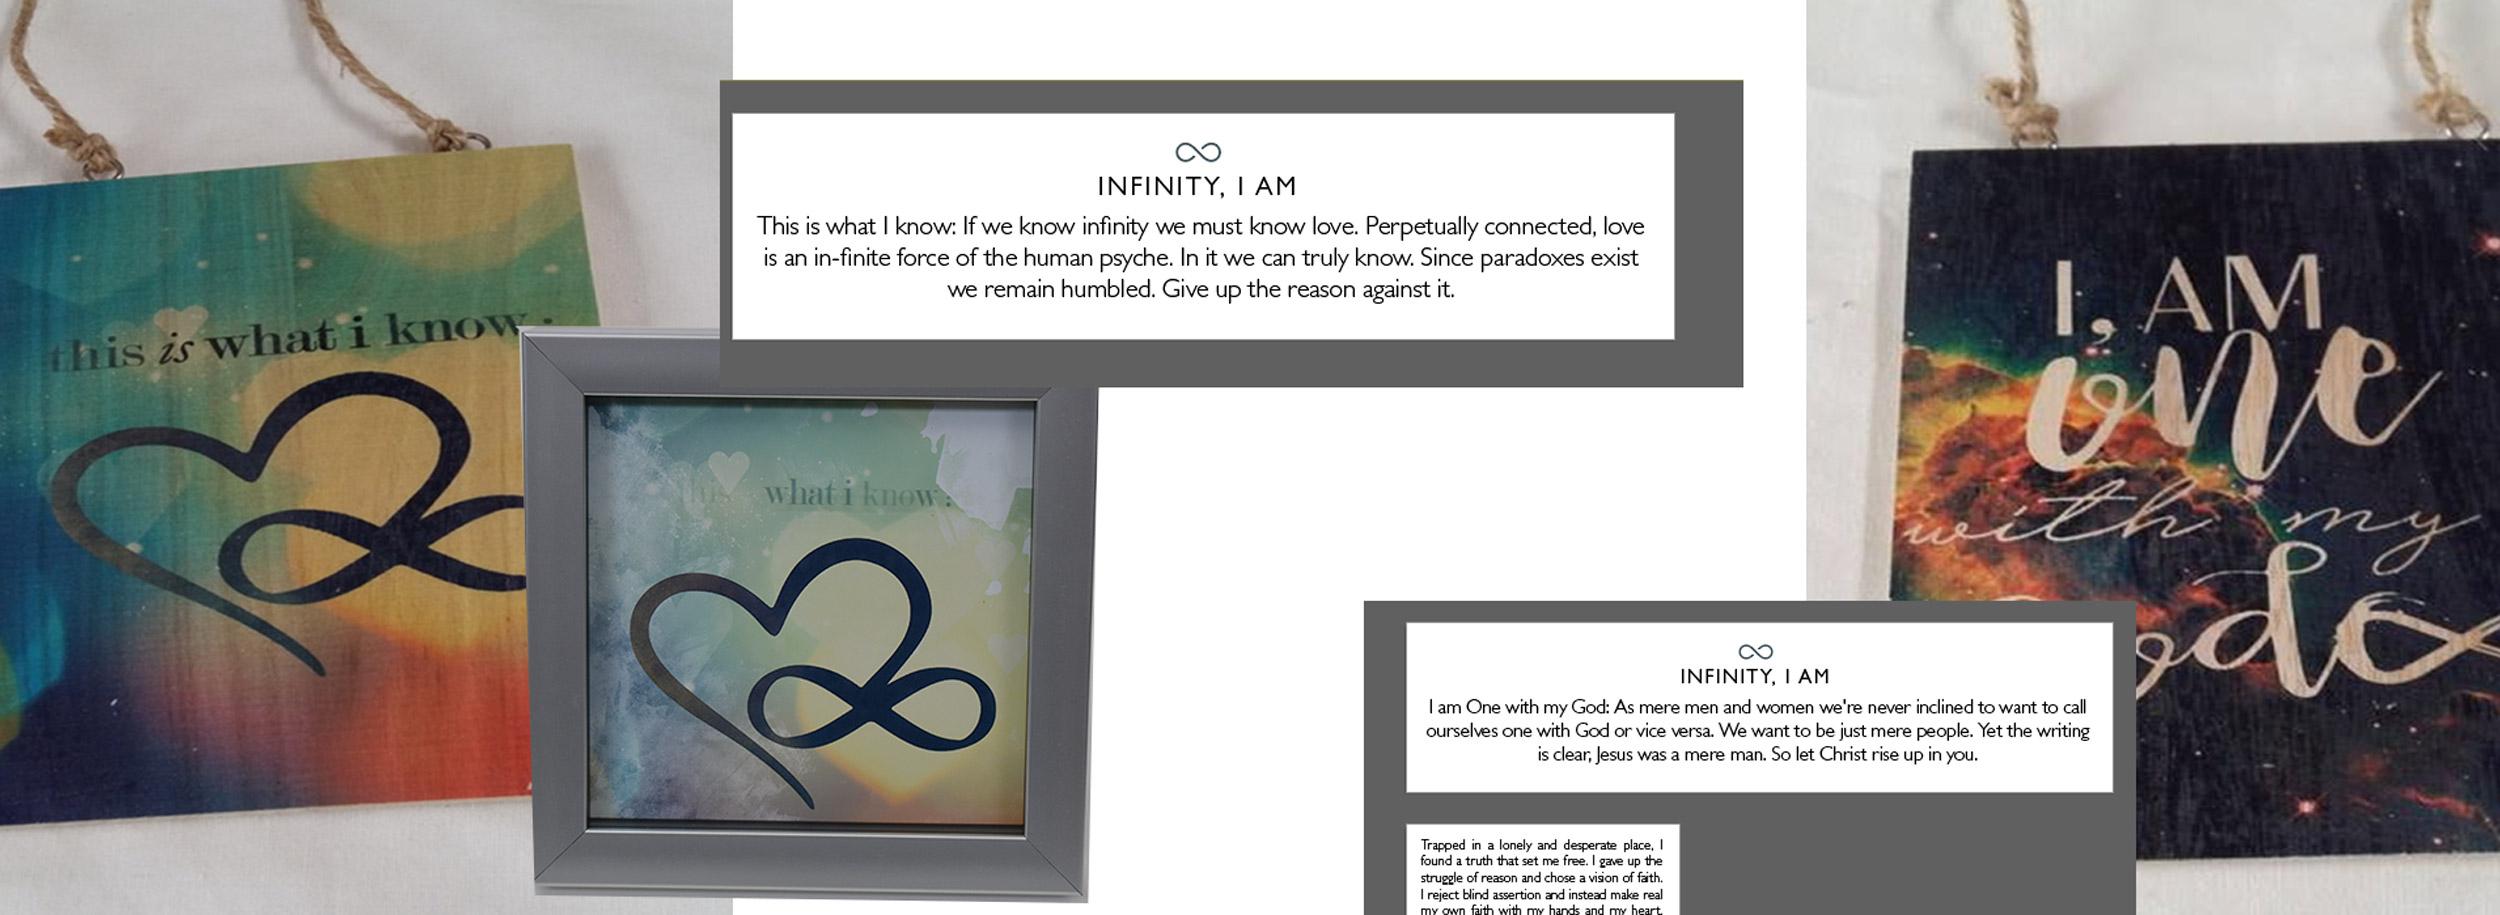 infinityframes2.jpg